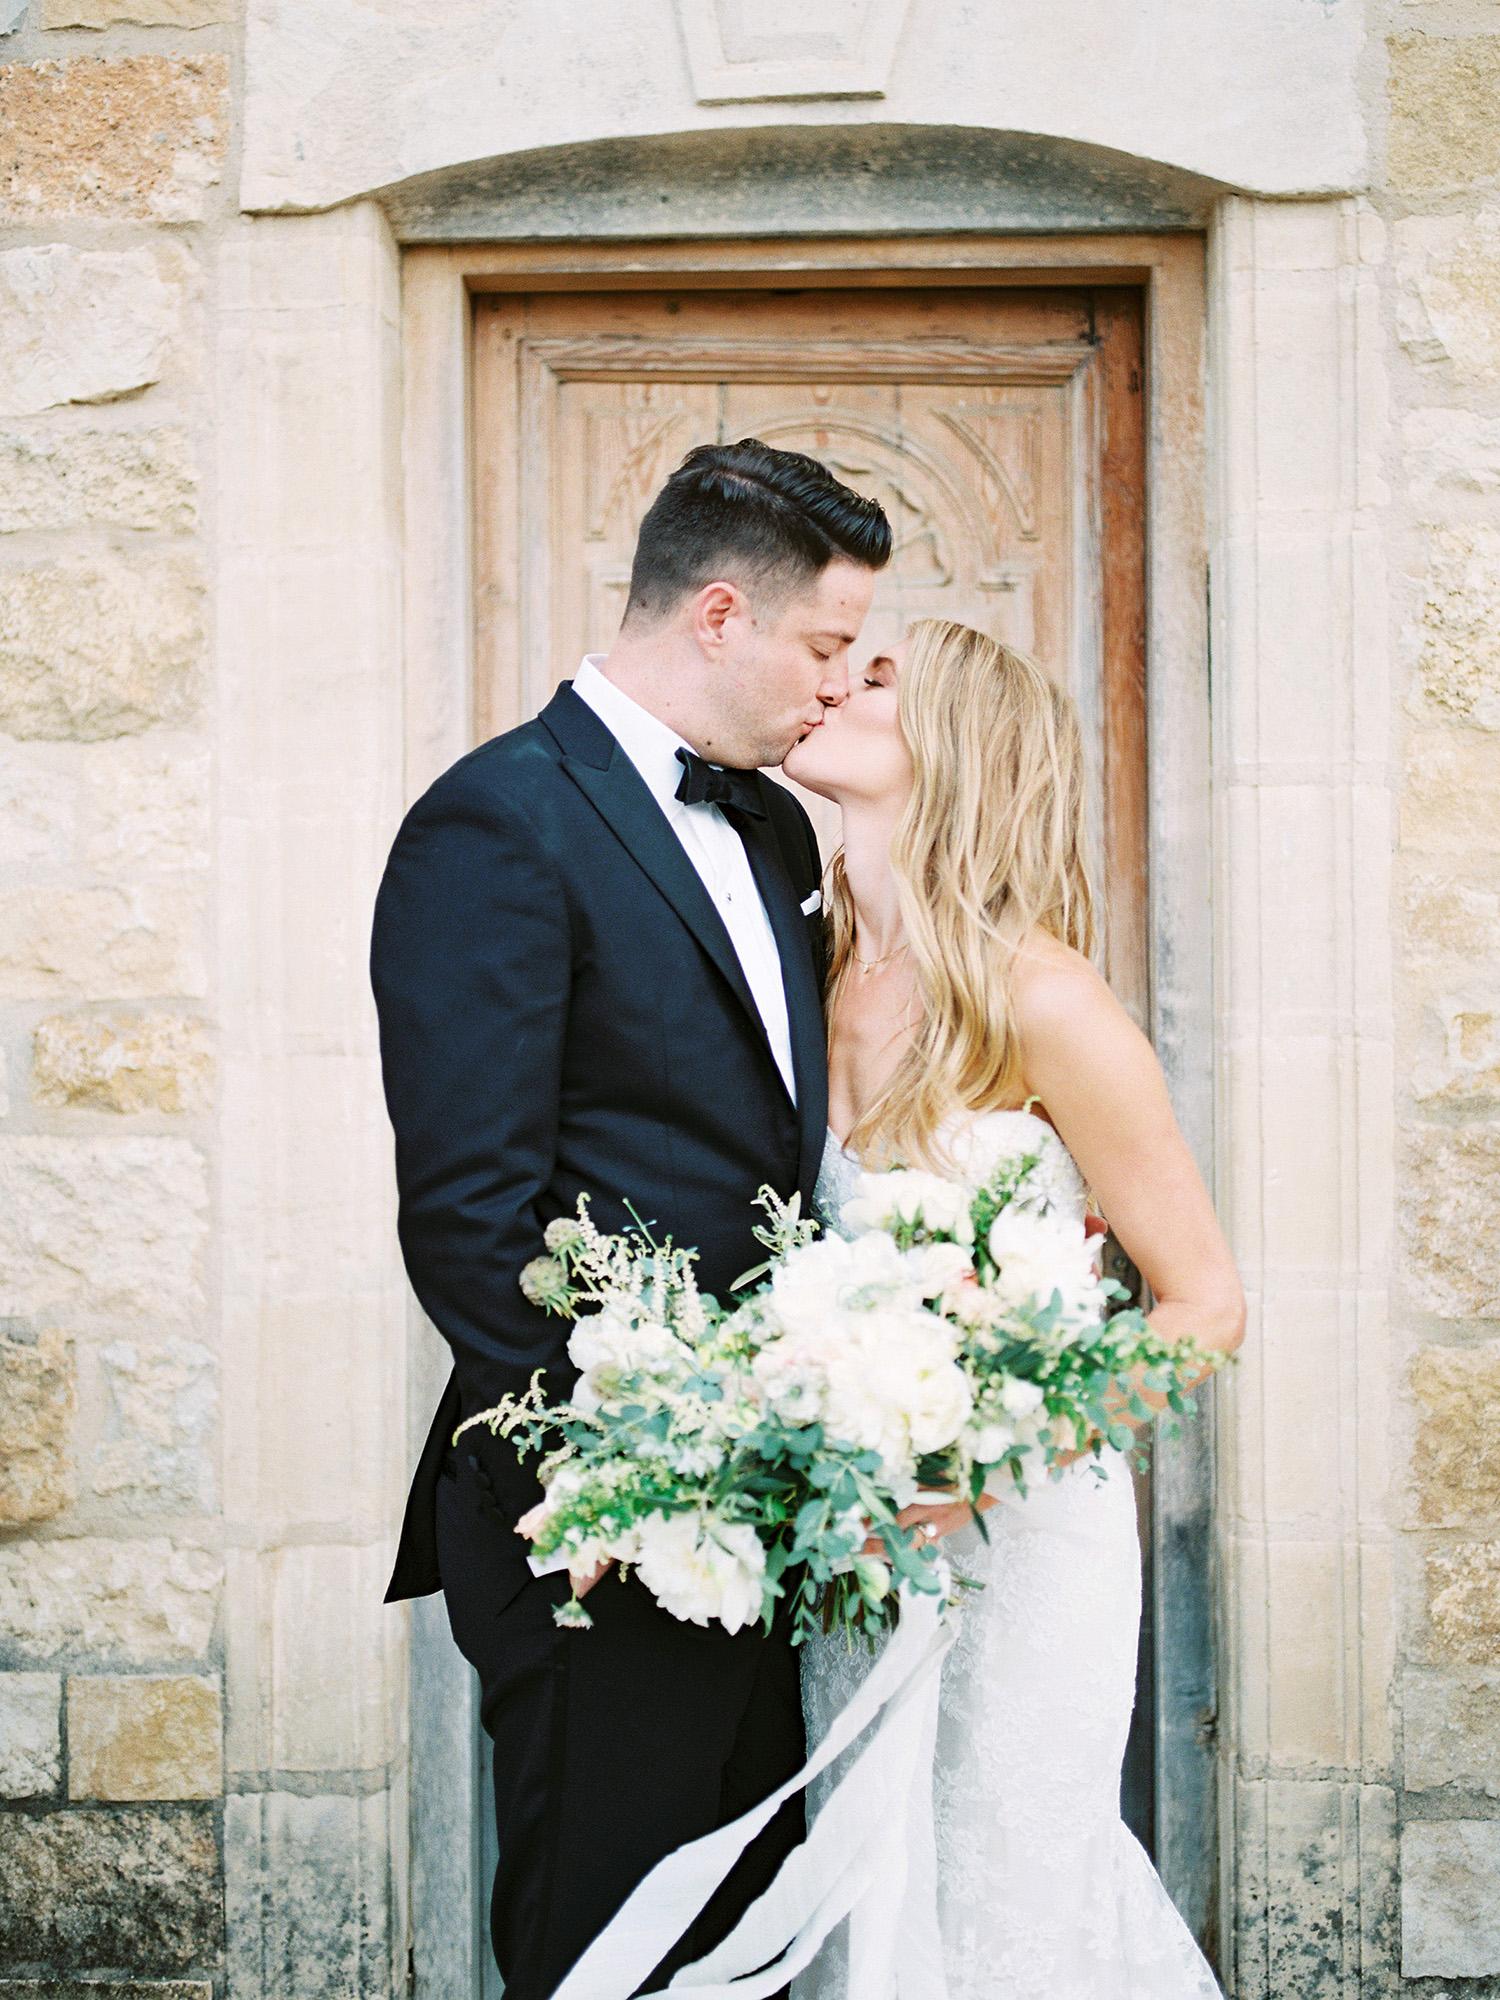 kati erik wedding couple kissing